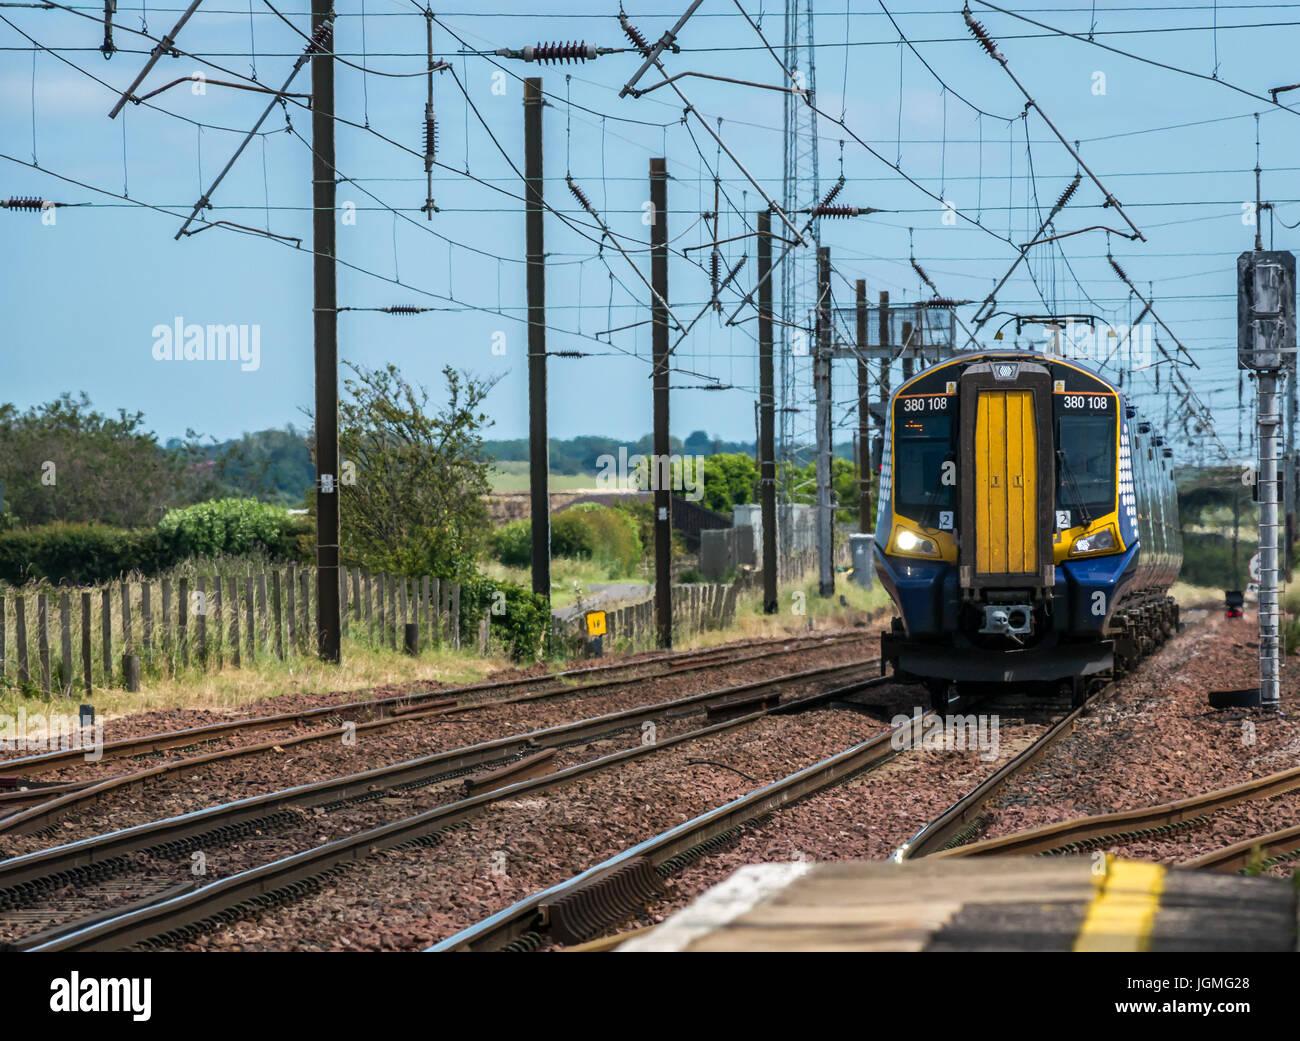 Scotrail train on North Berwick line approaching Drem train station, East Lothian, Scotland, UK - Stock Image